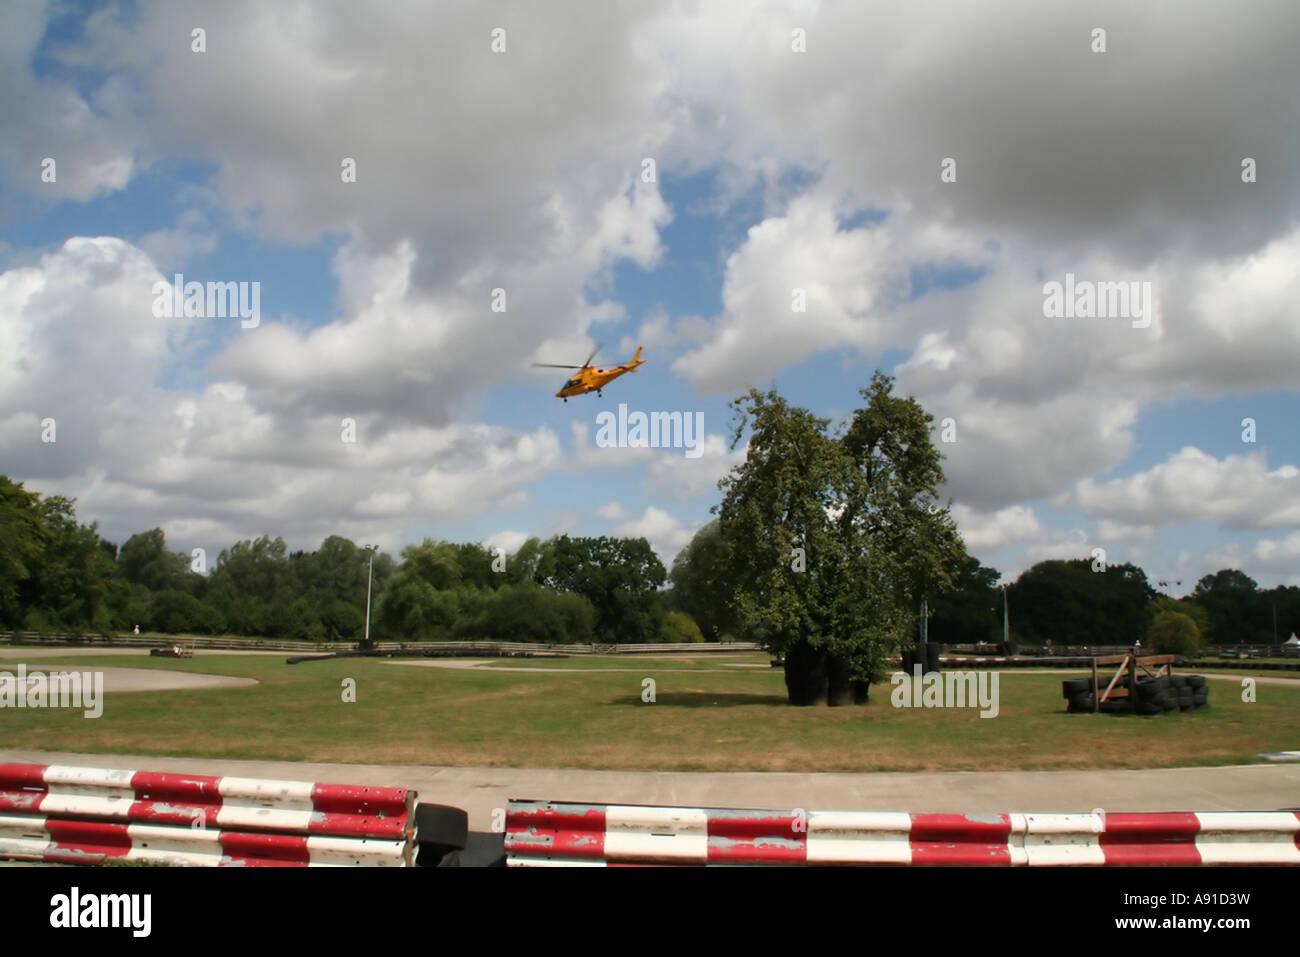 An air ambulance at a race circuit - Stock Image